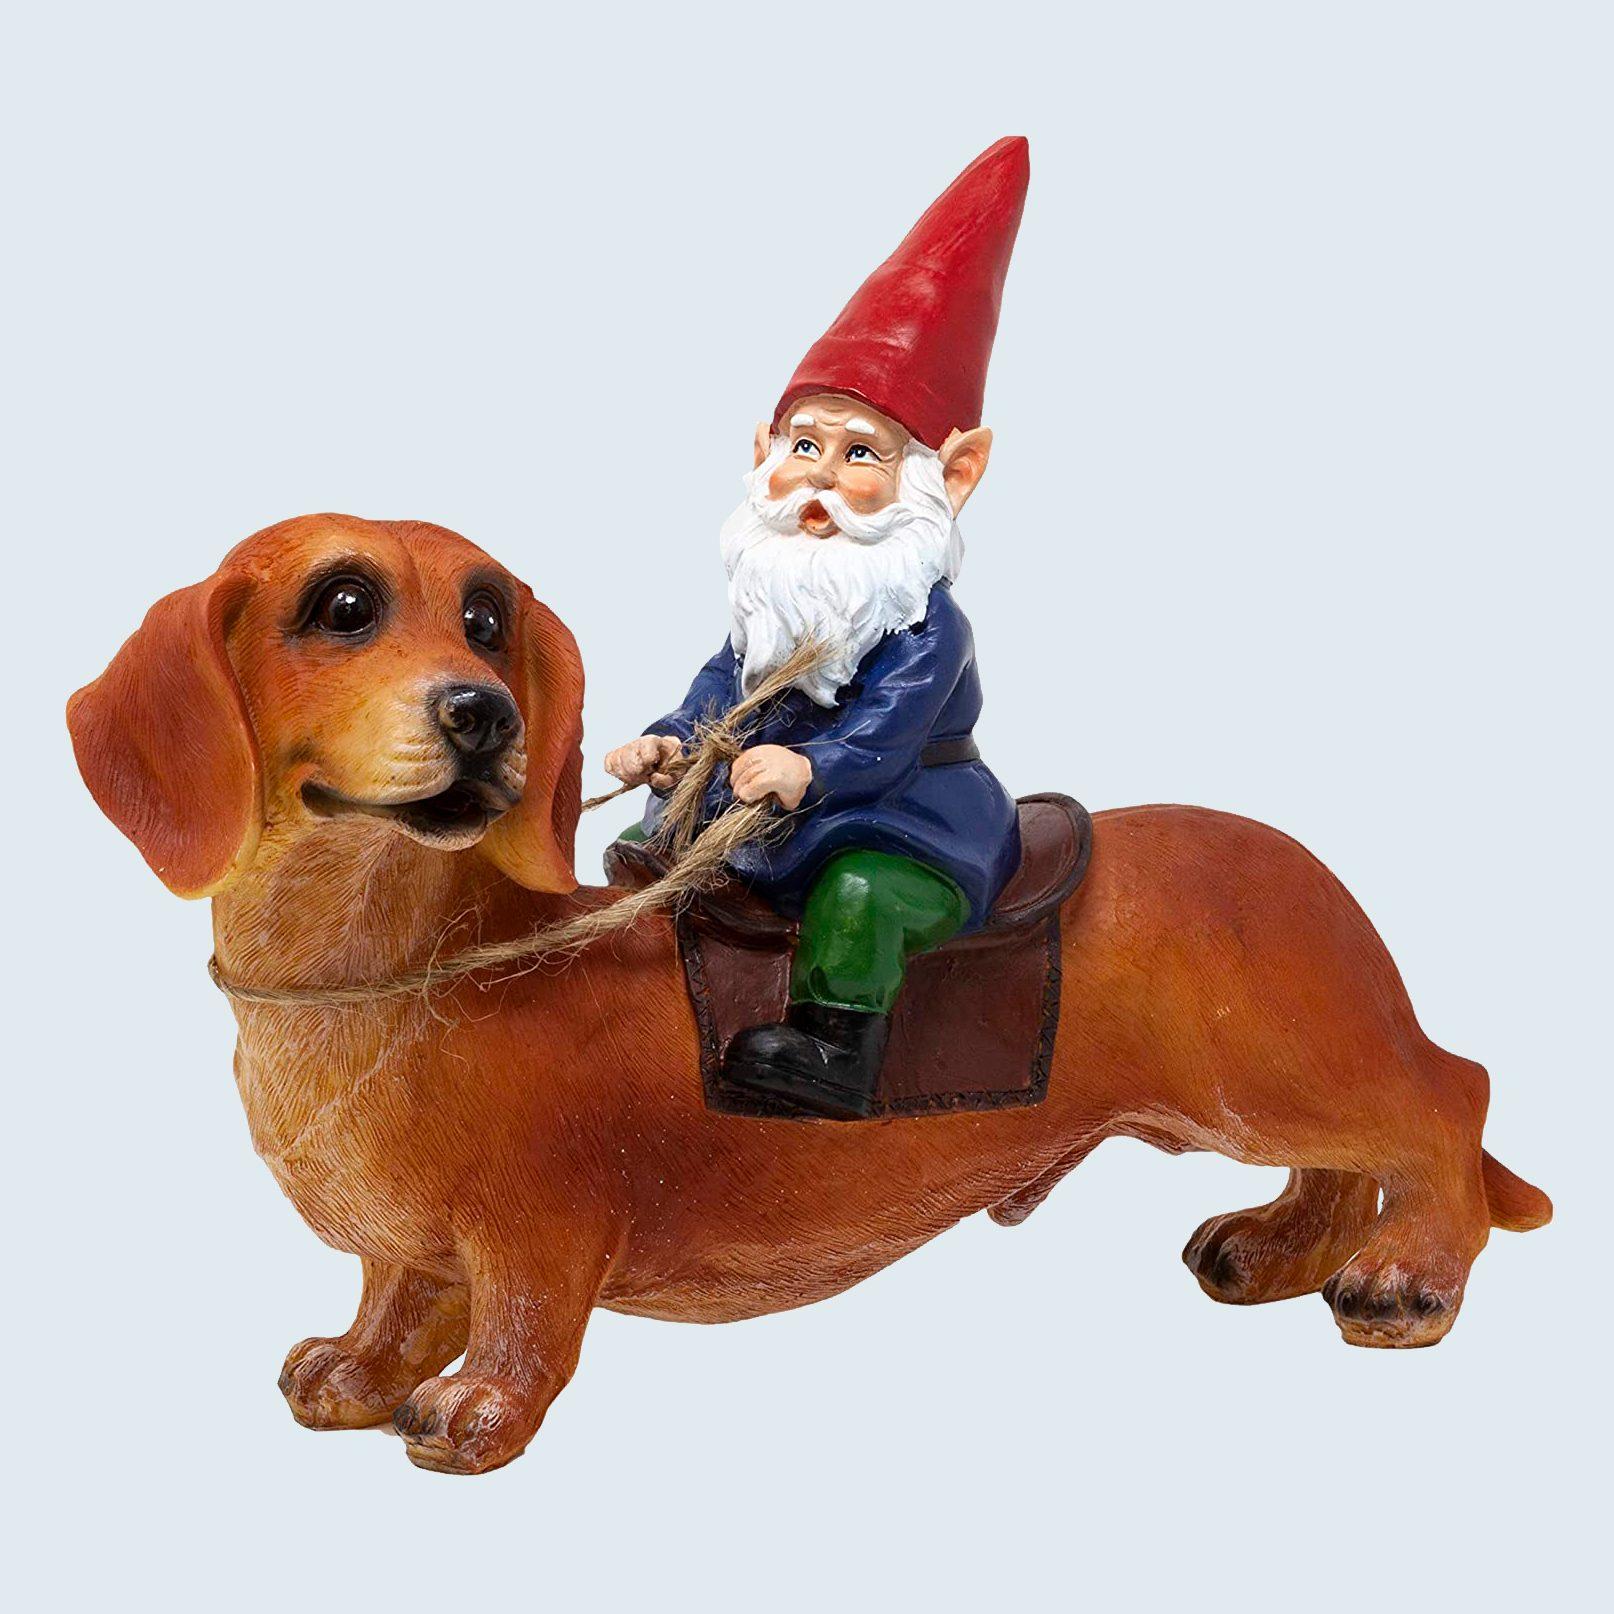 gnome riding dachshund garden statue